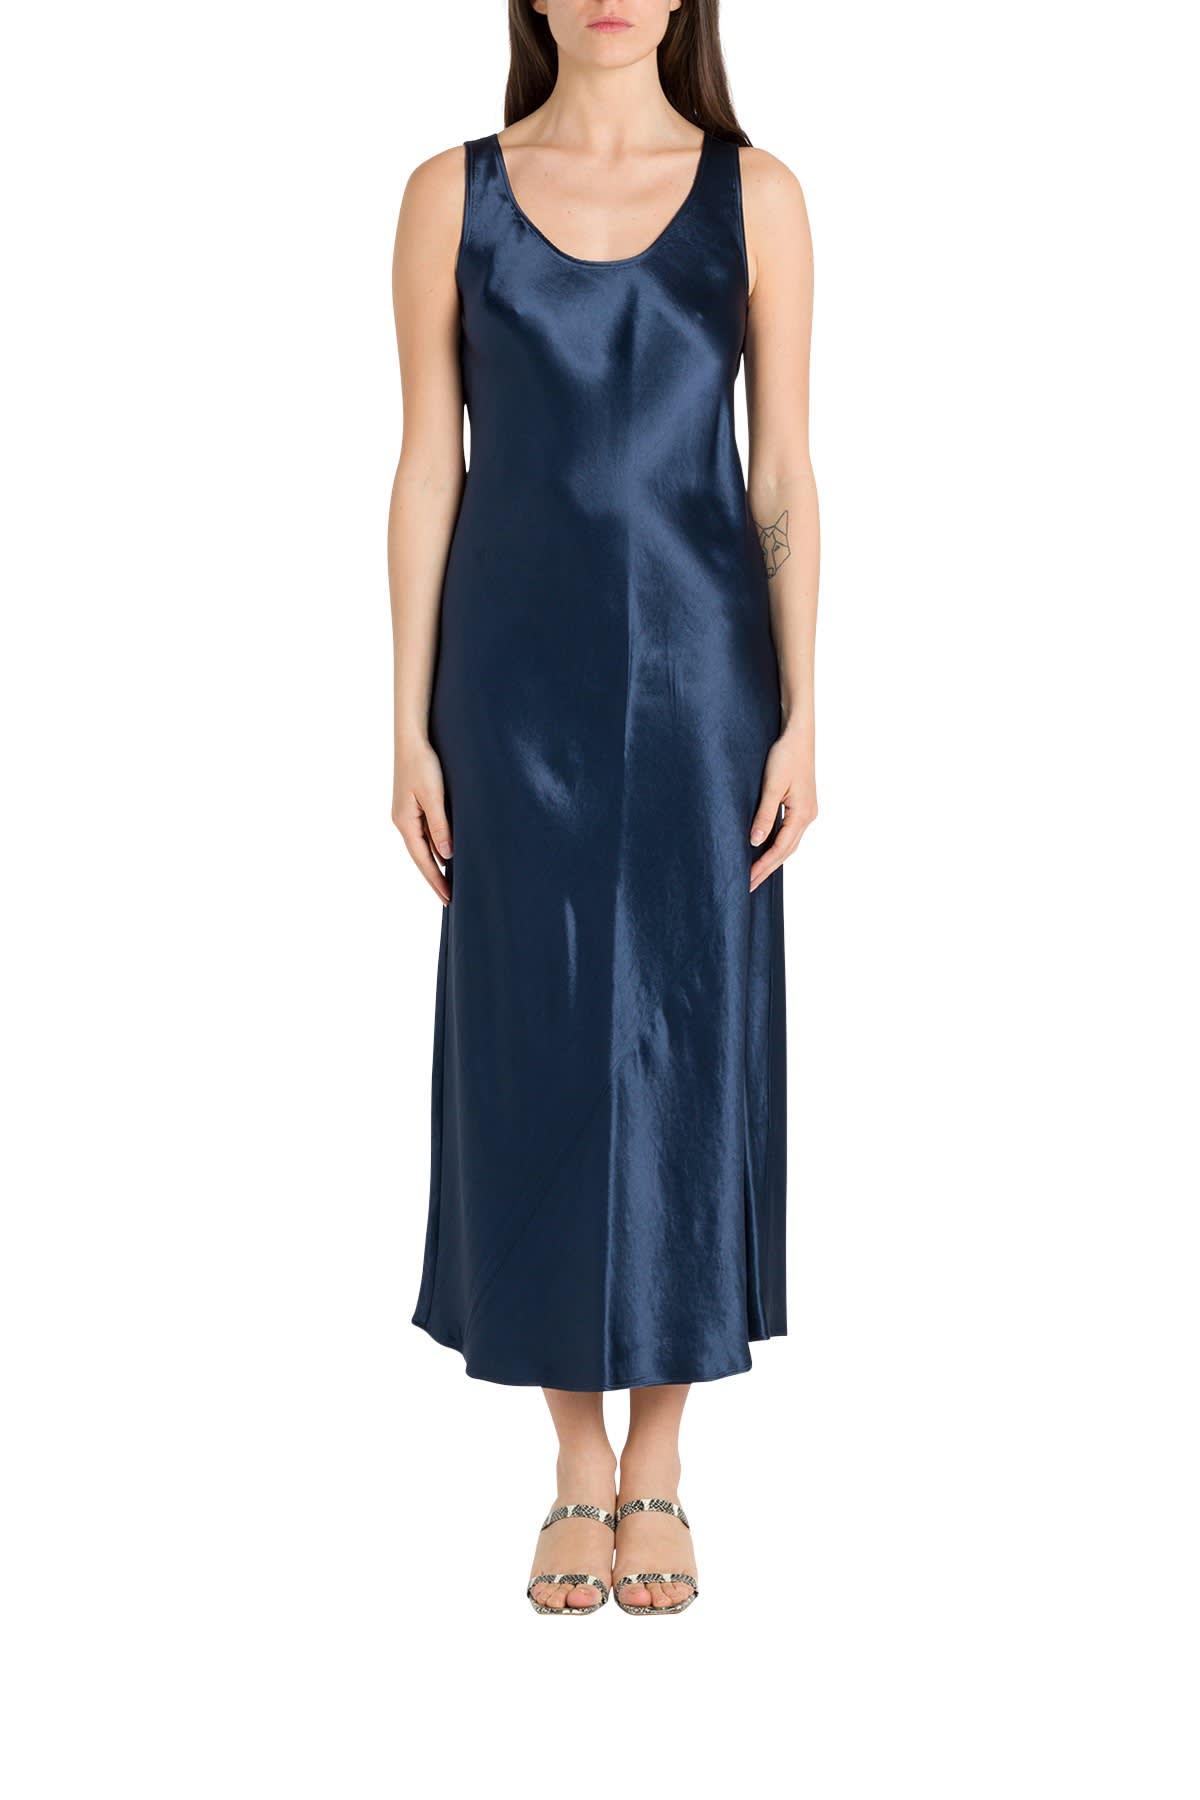 Max Mara Slip Dress